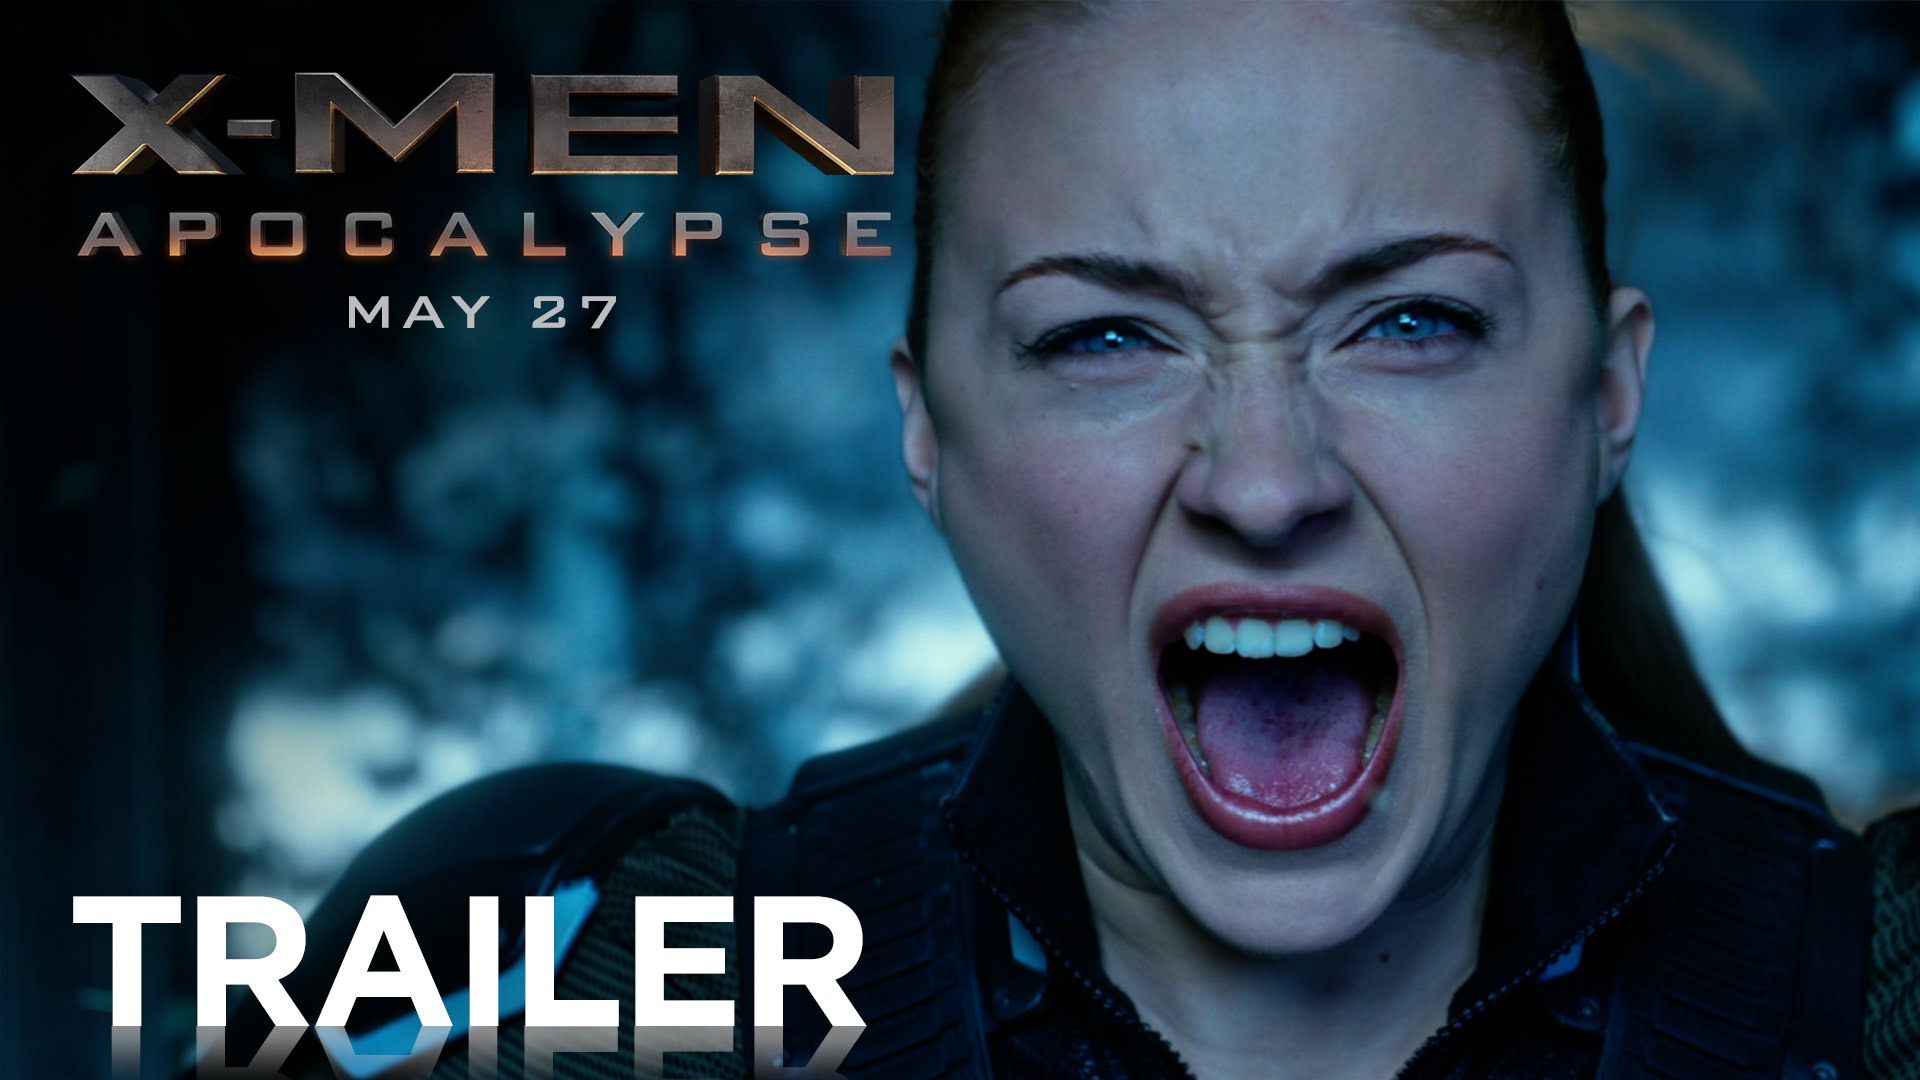 latest xmen apocalypse trailer teases wolverine